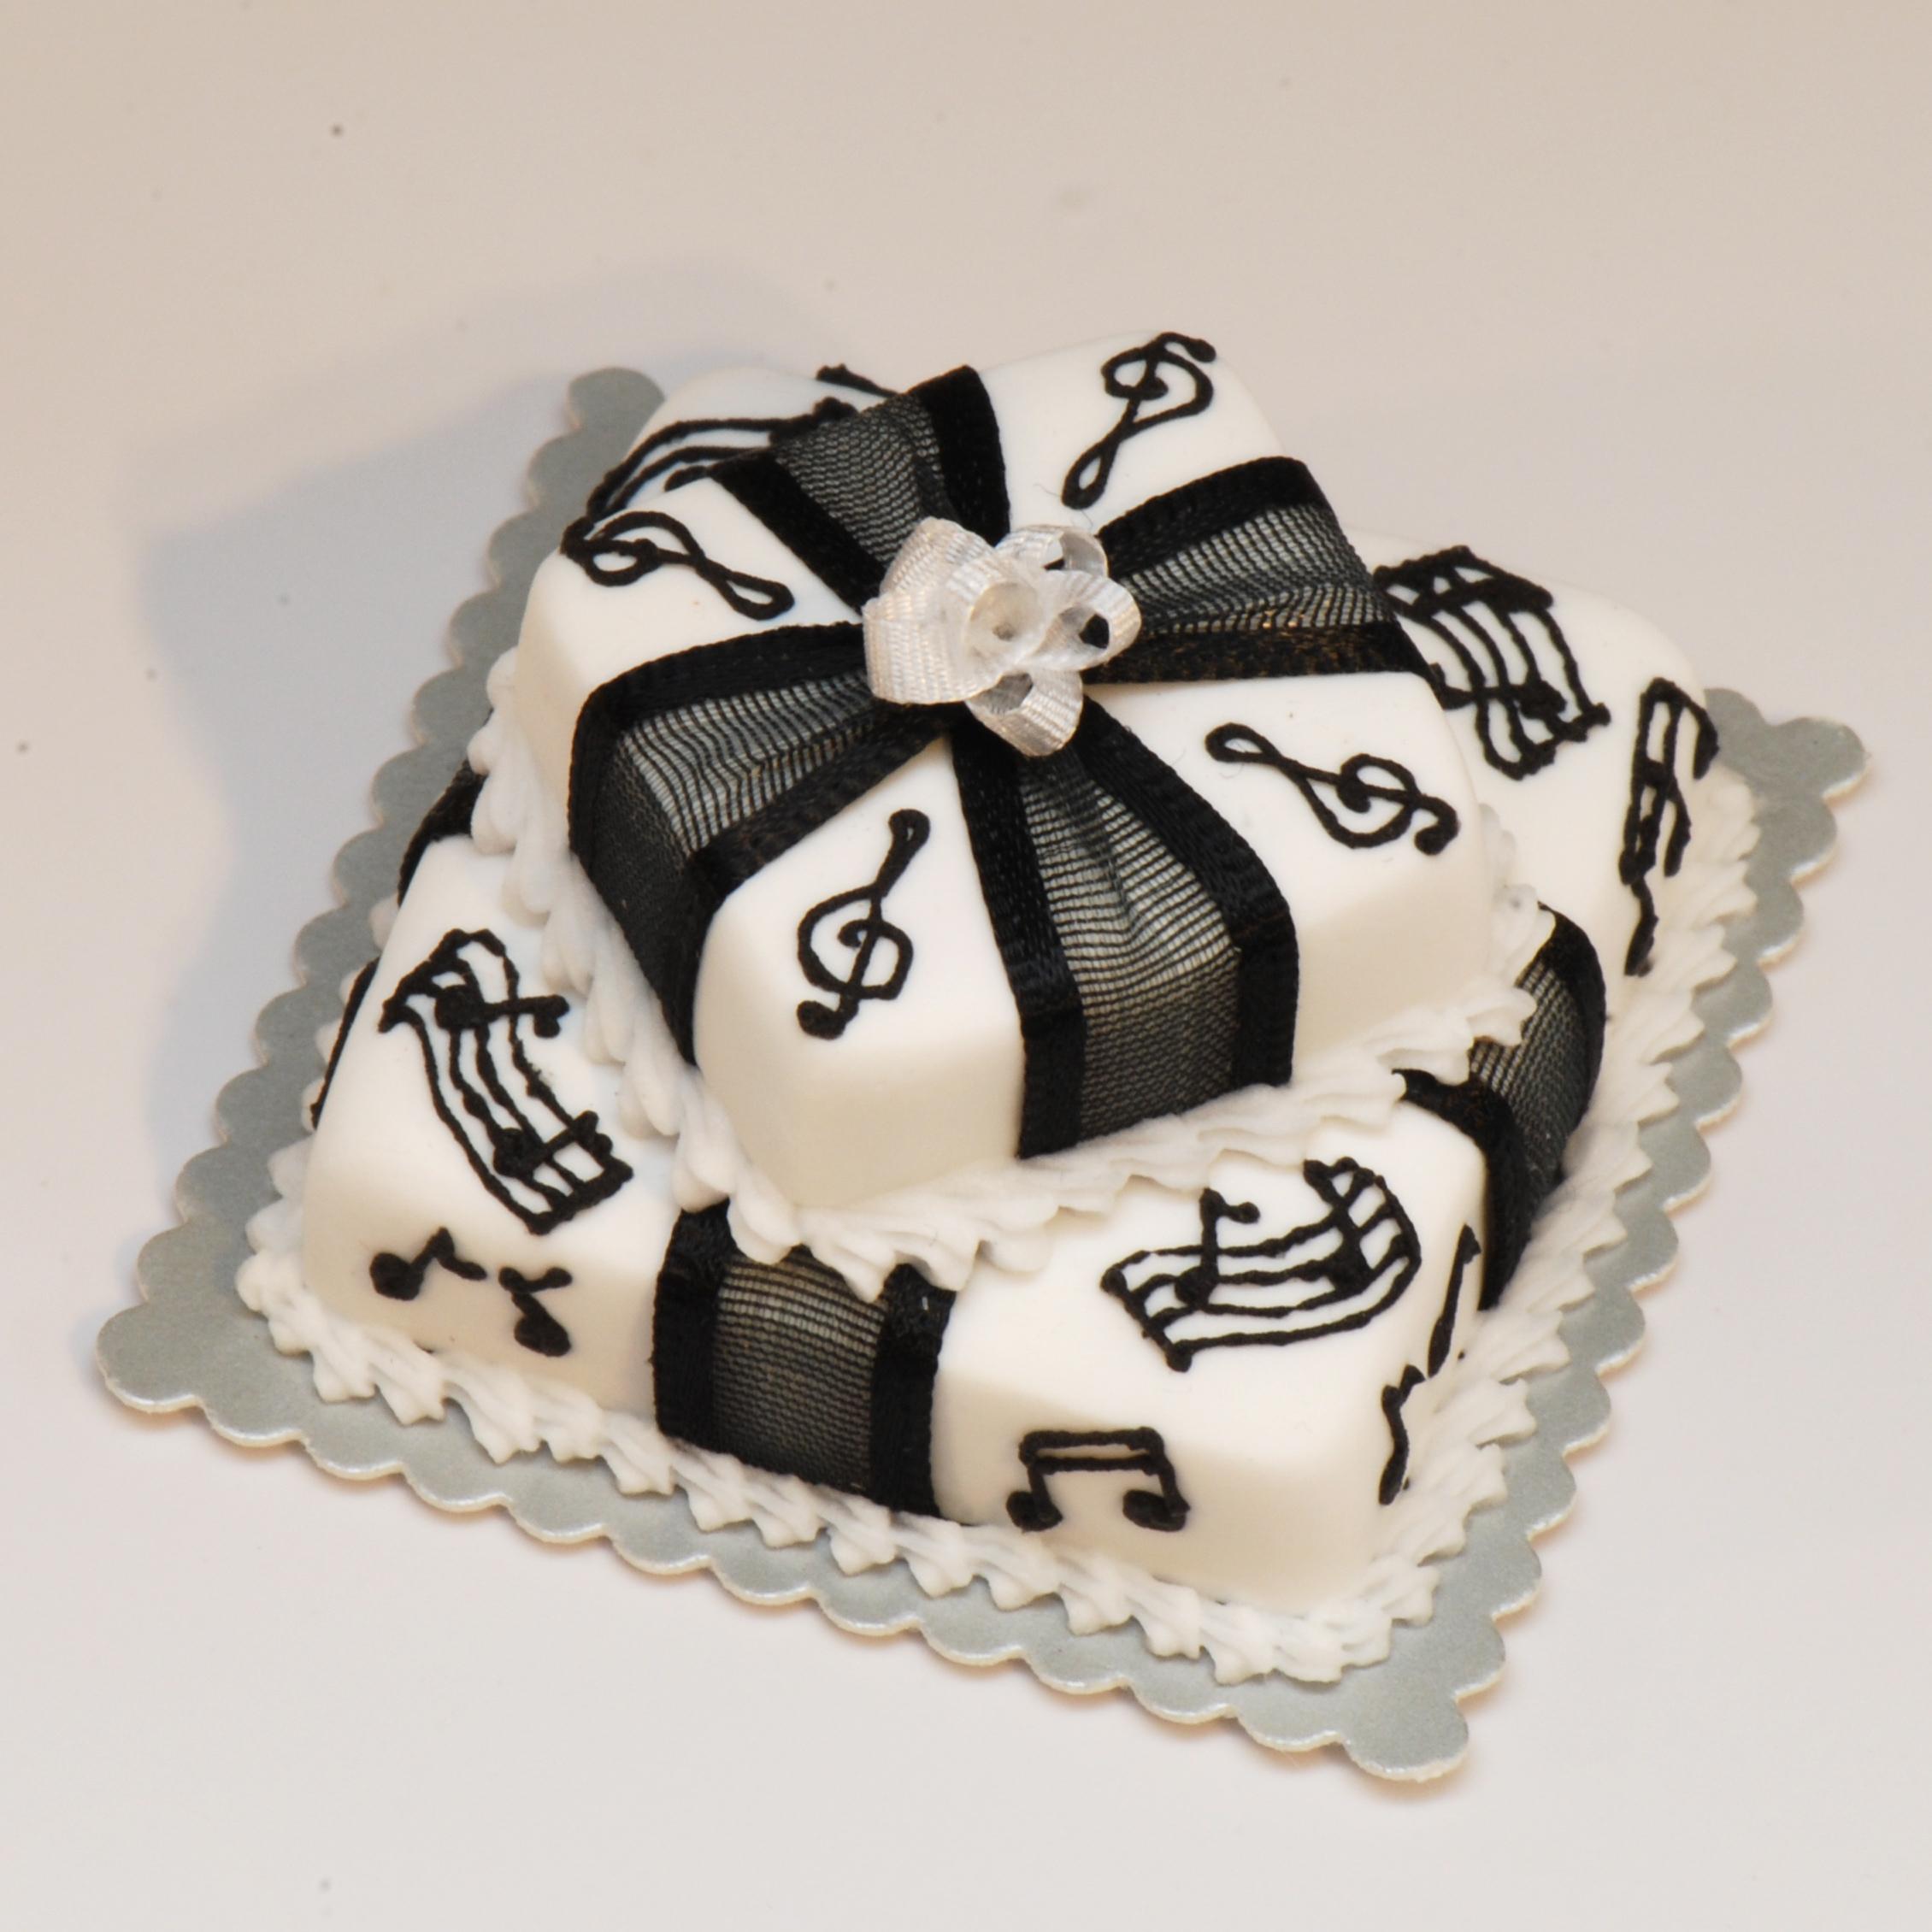 Music Notes Cake Decorating